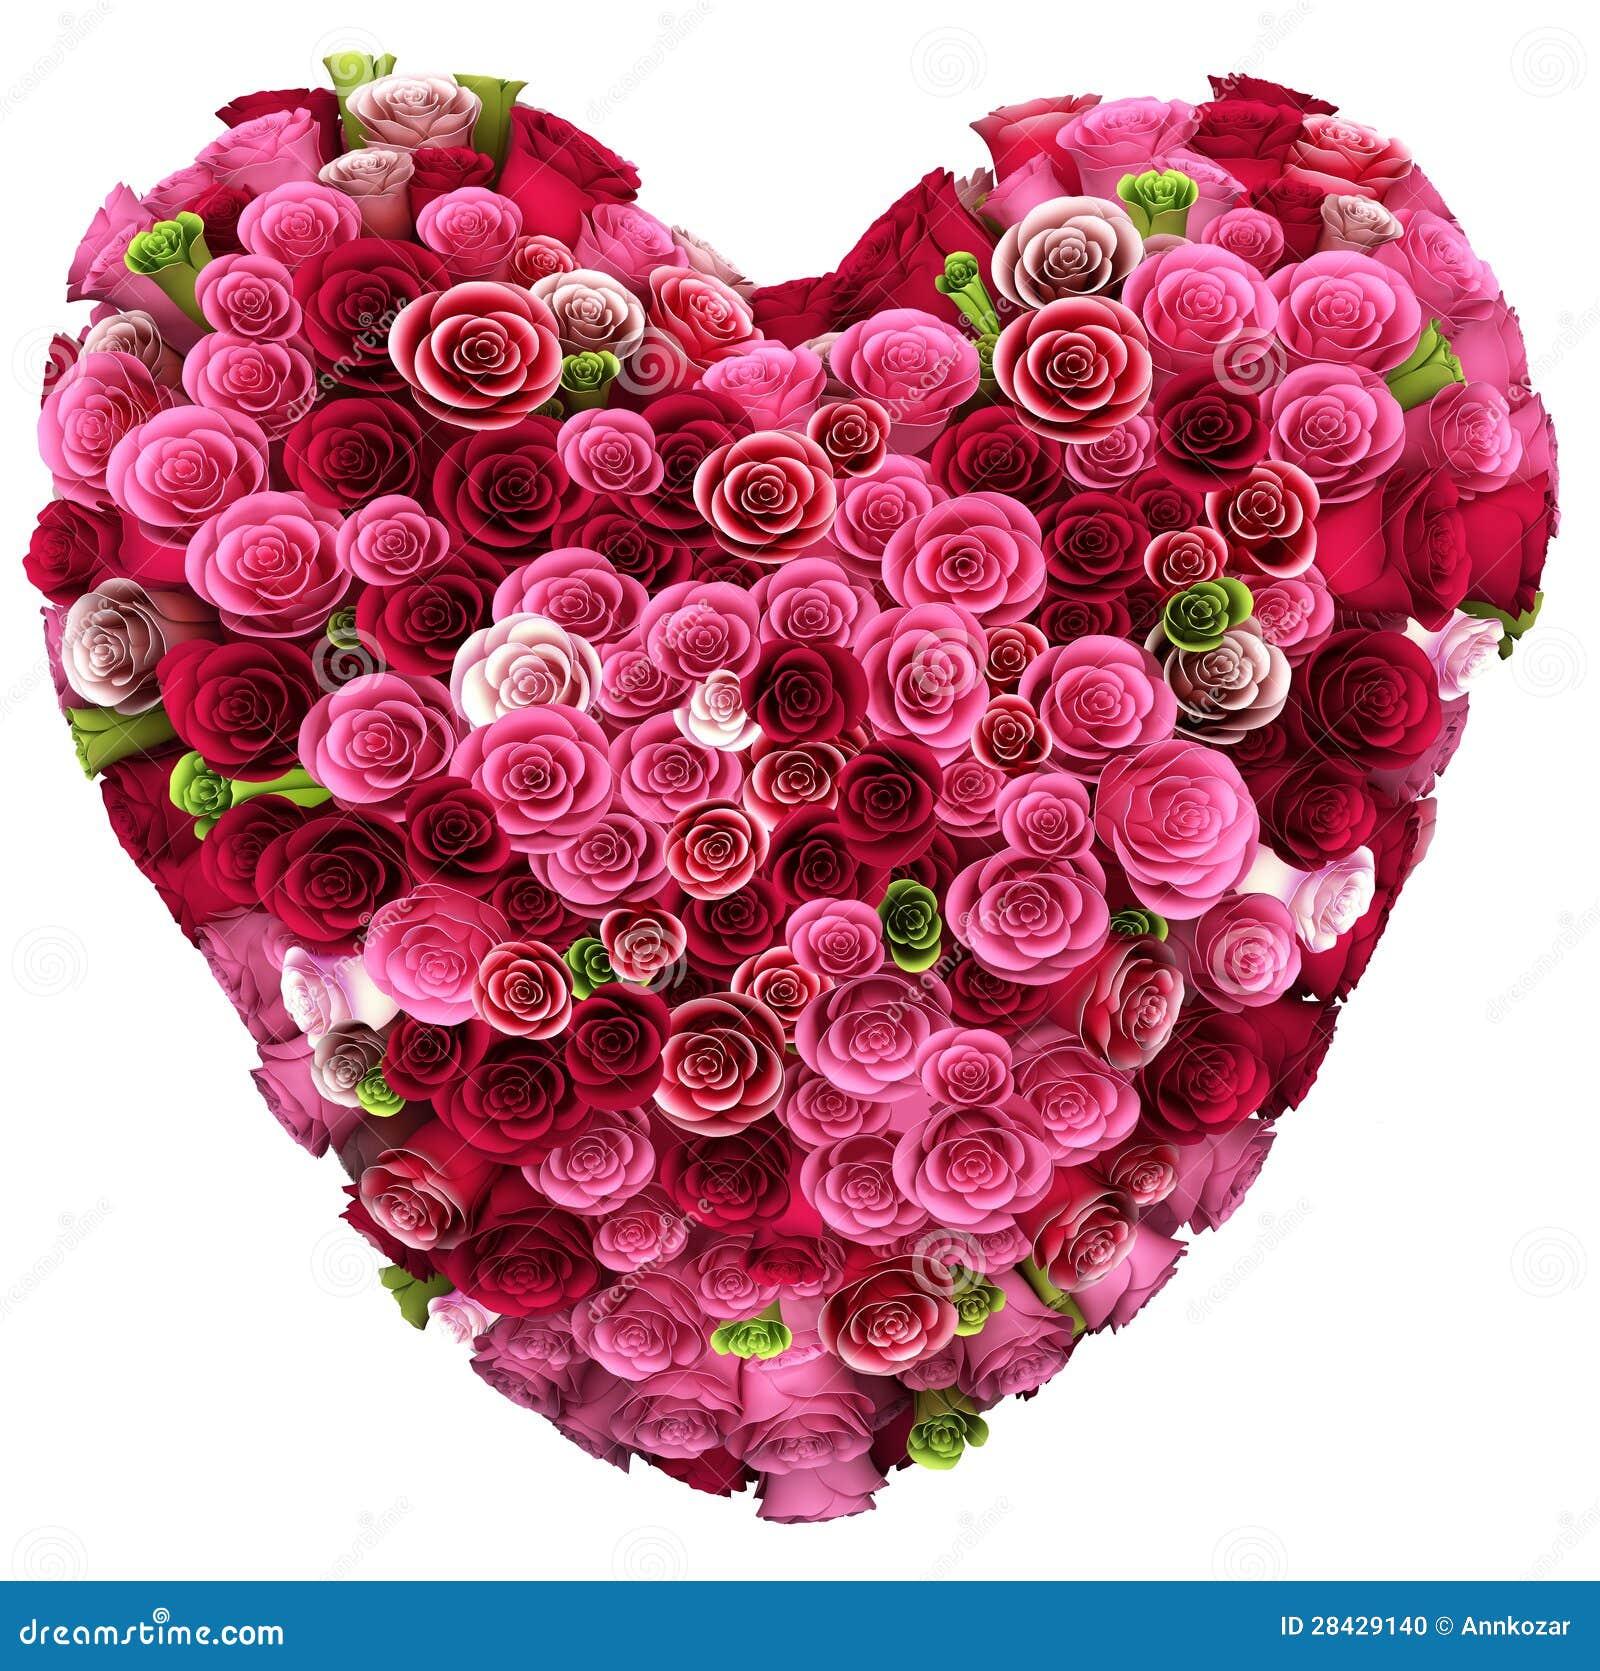 bouquet of color roses in heart shape stock illustration image 28429140. Black Bedroom Furniture Sets. Home Design Ideas